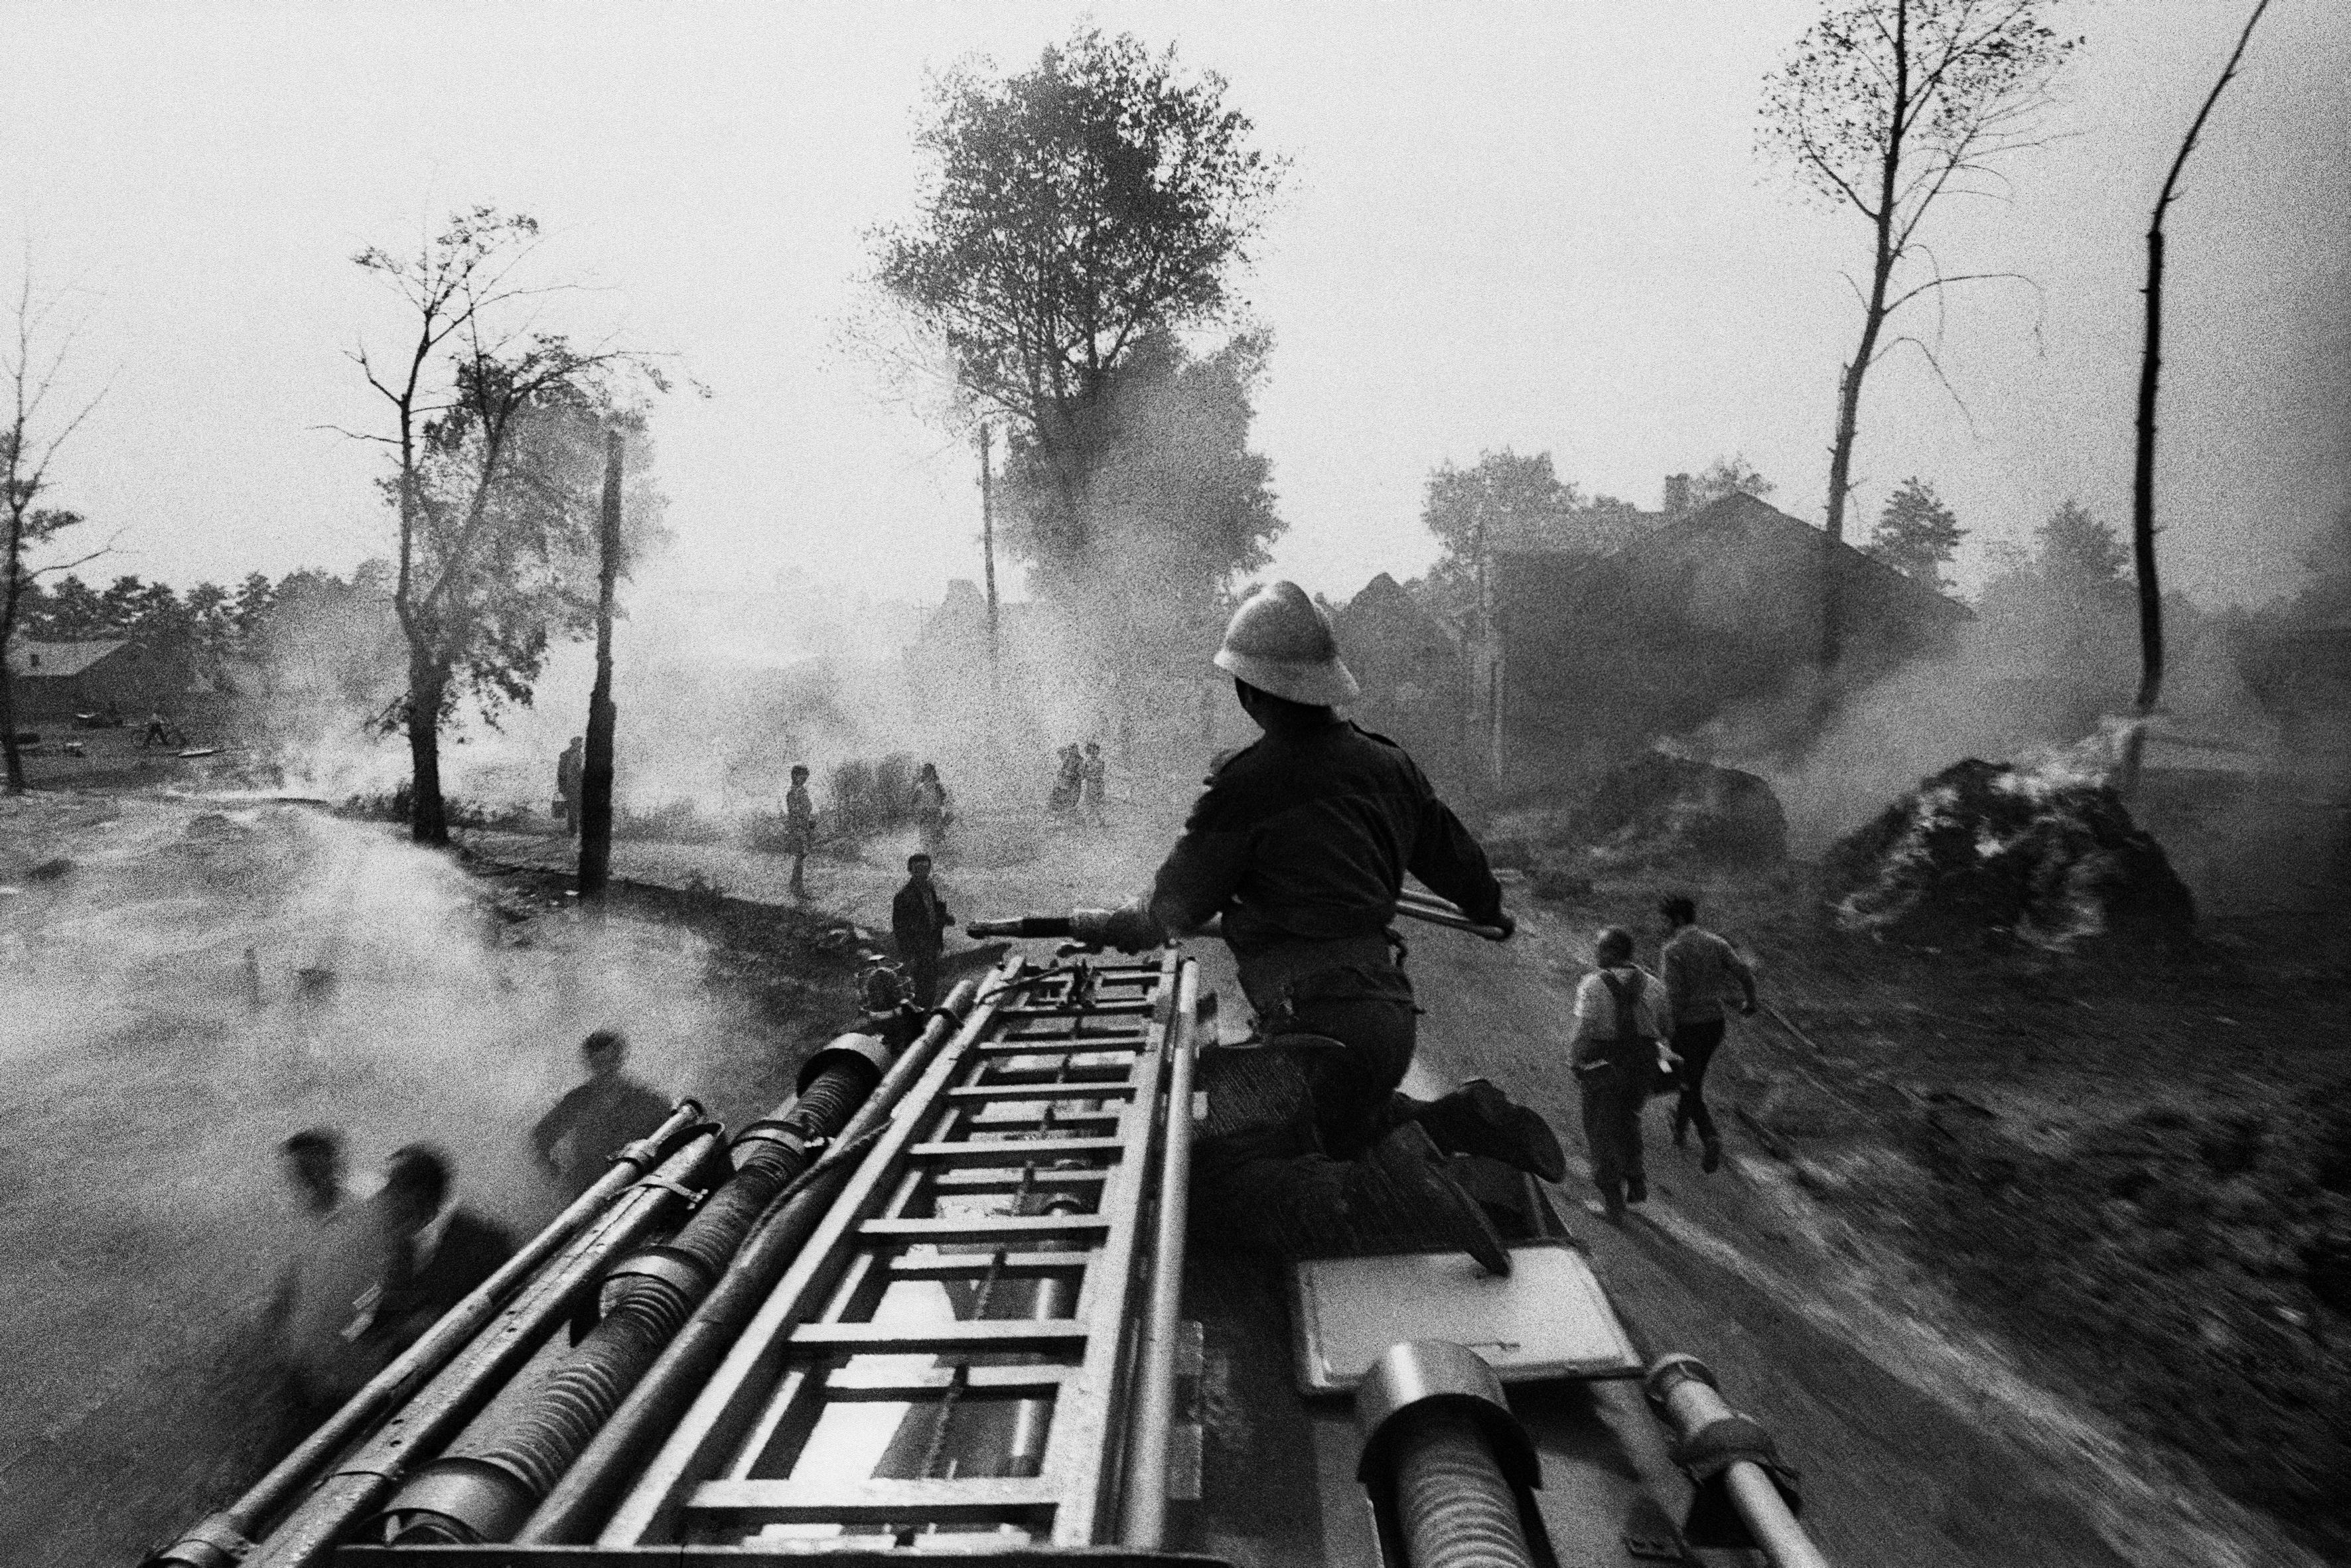 Rudna, 09.1968. Pożar wsi. Fot. Aleksander Jałosiński/FORUM